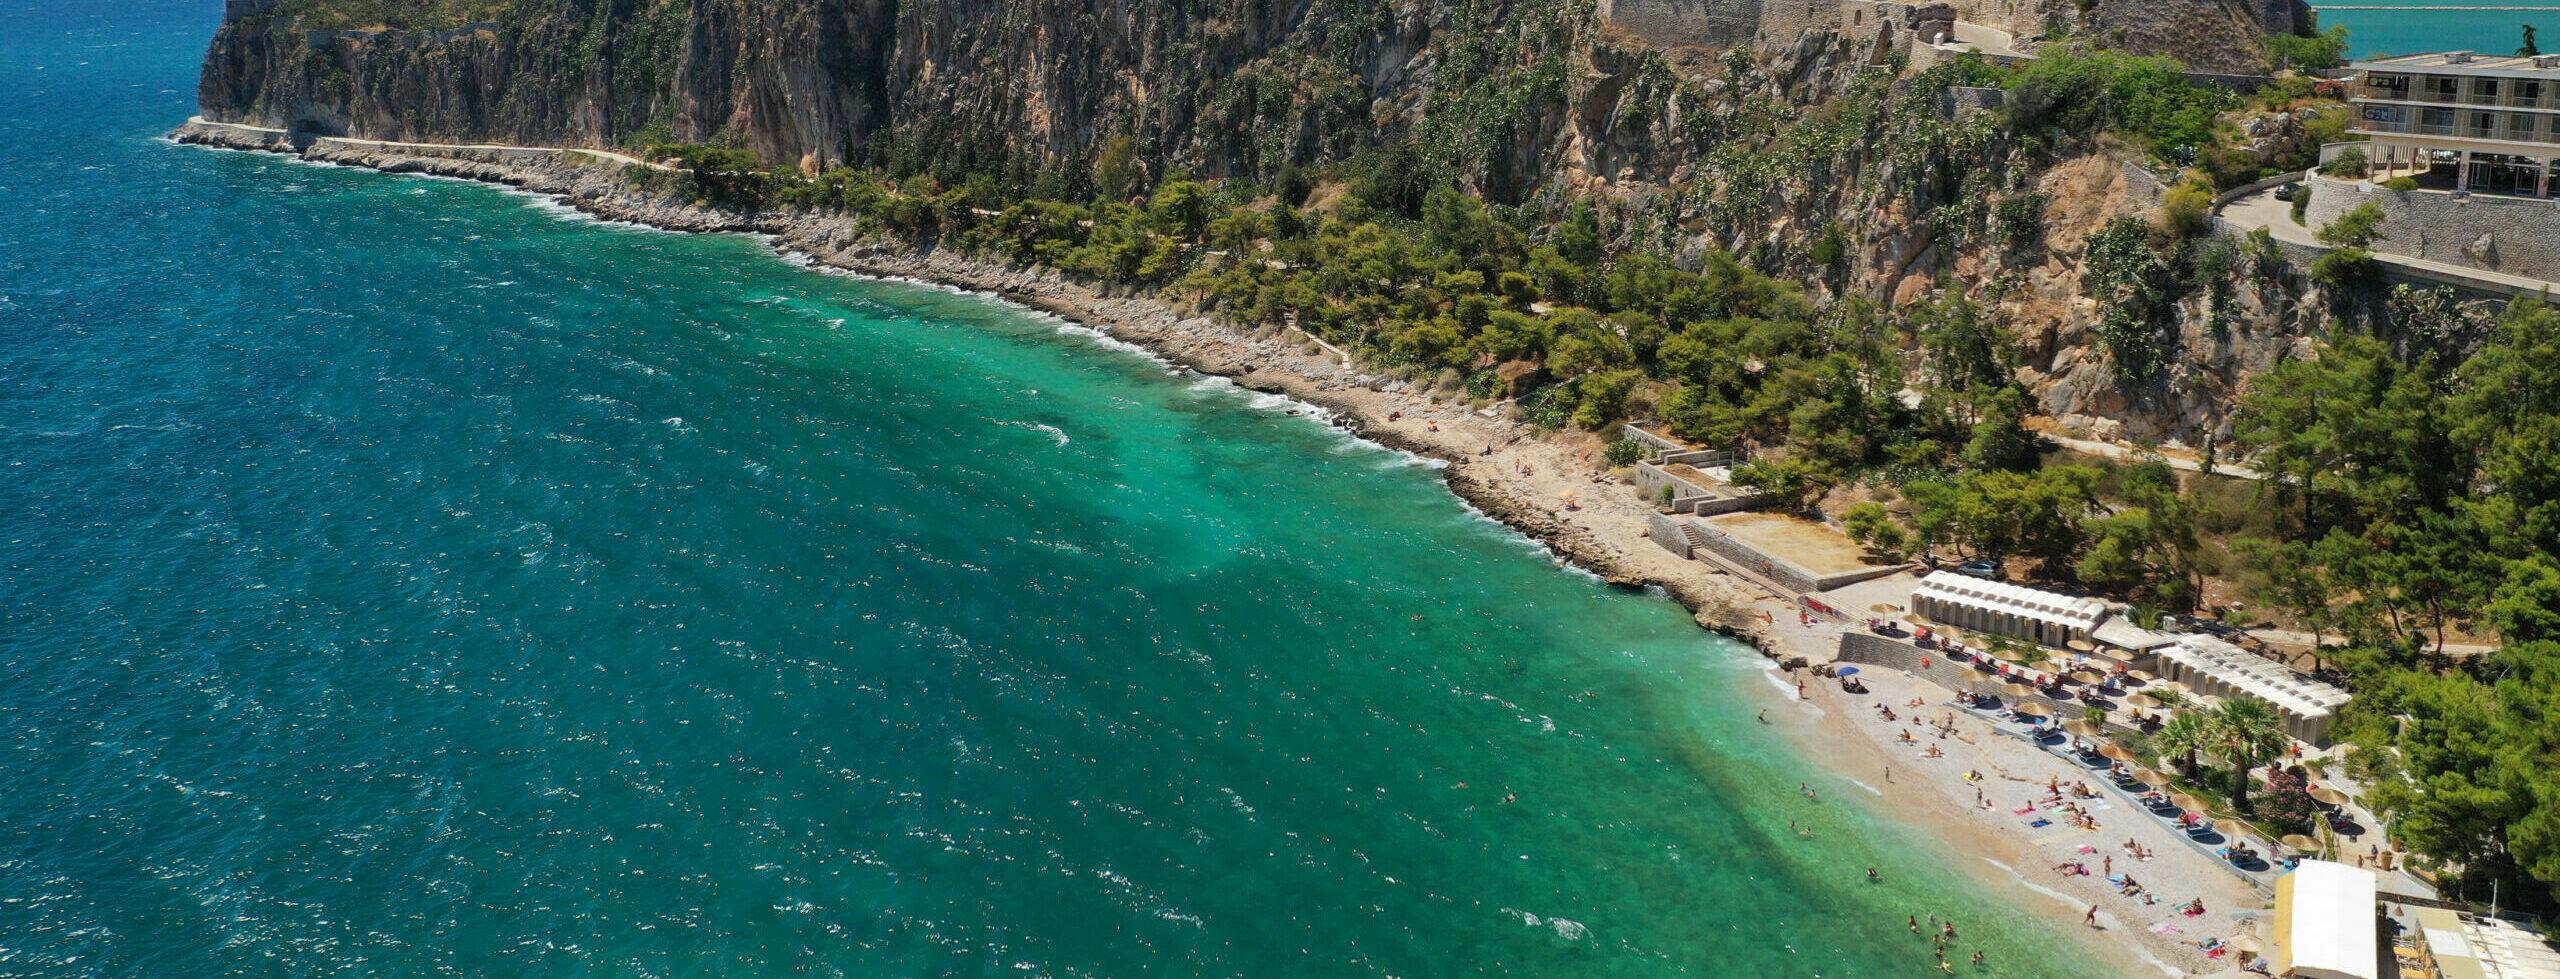 Arvanitia: The small but sensational beach